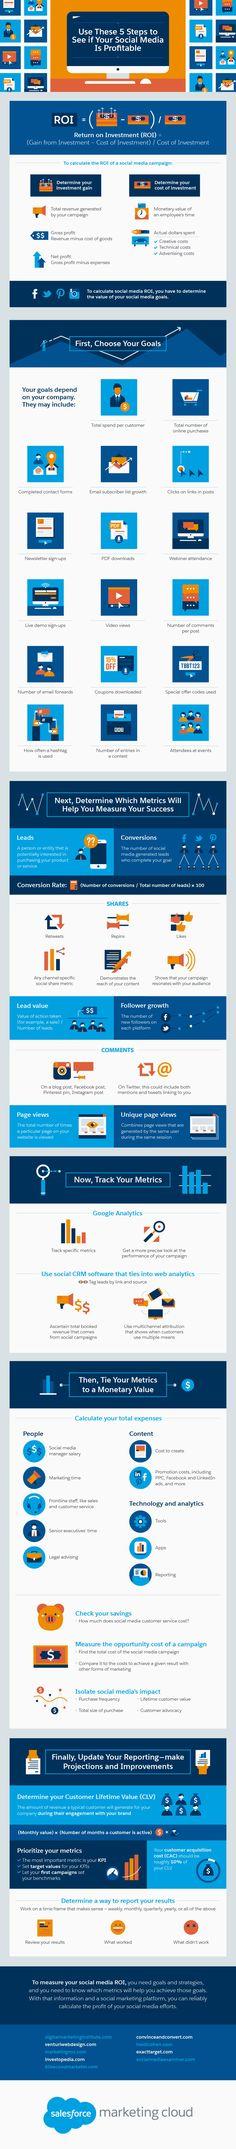 5 Steps to Social Media ROI [Infographic] | Social Media Today